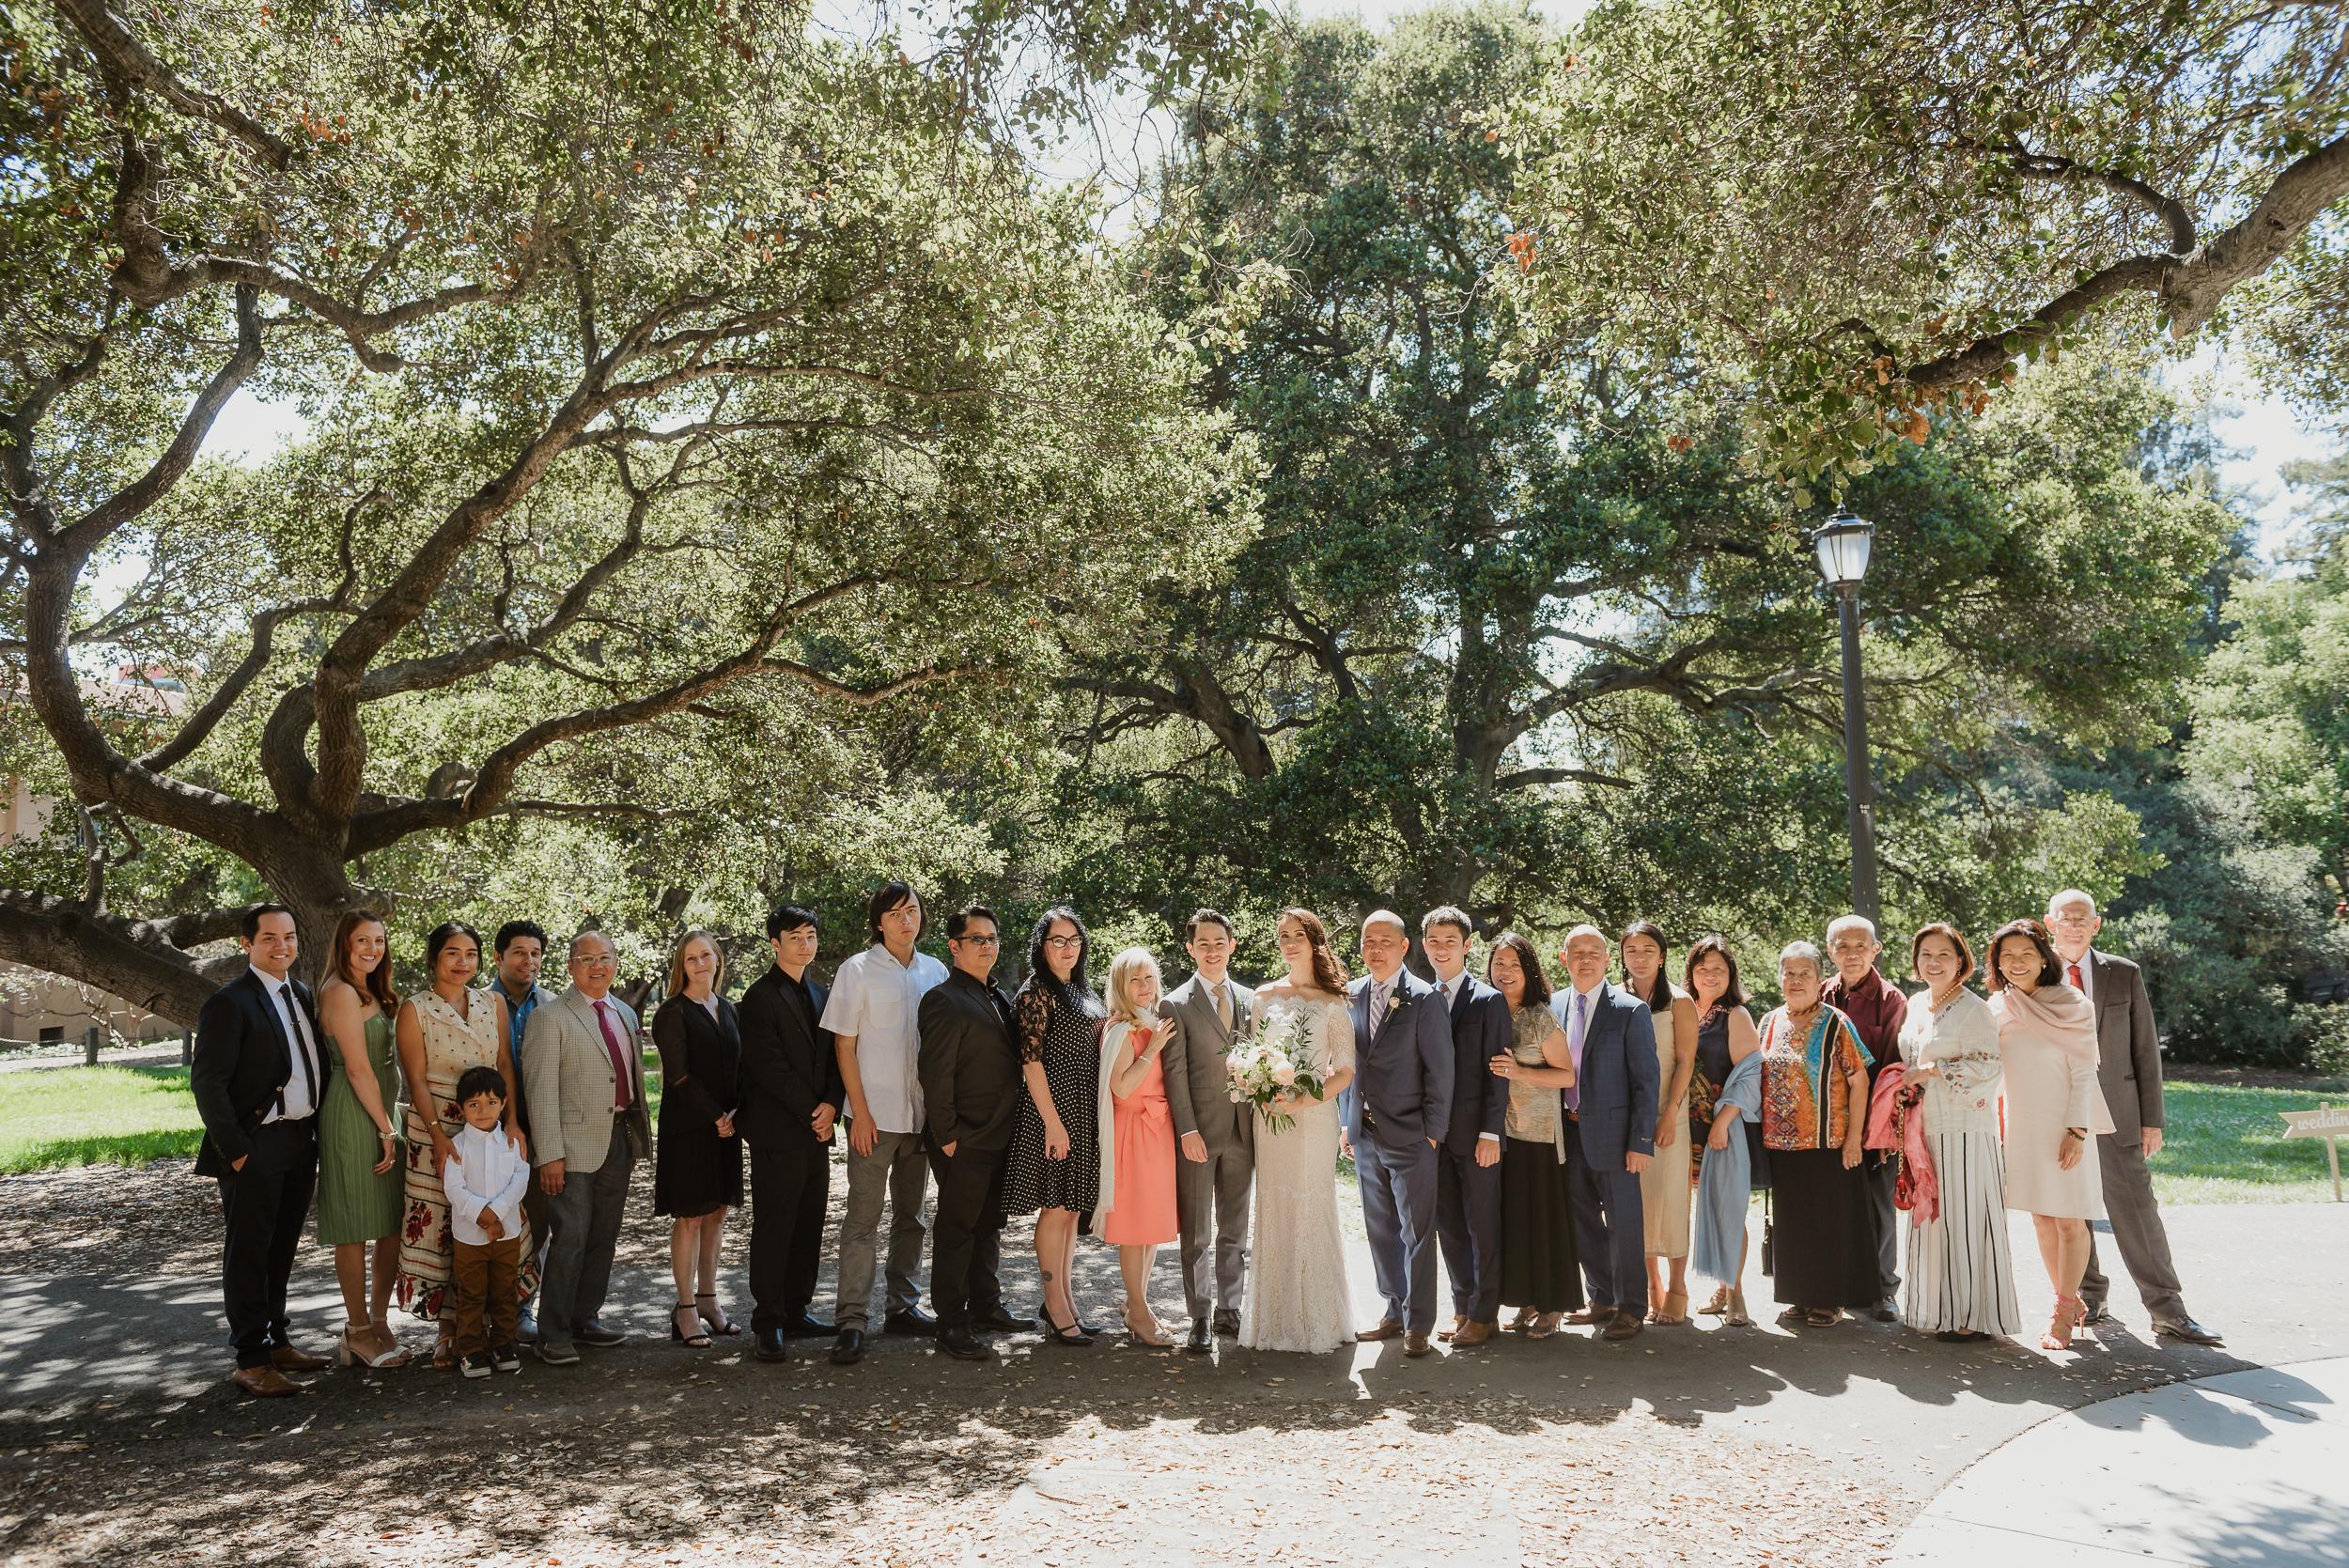 13-berkeley-uc-faculty-club-wedding-kb-vivianchen-100.jpg